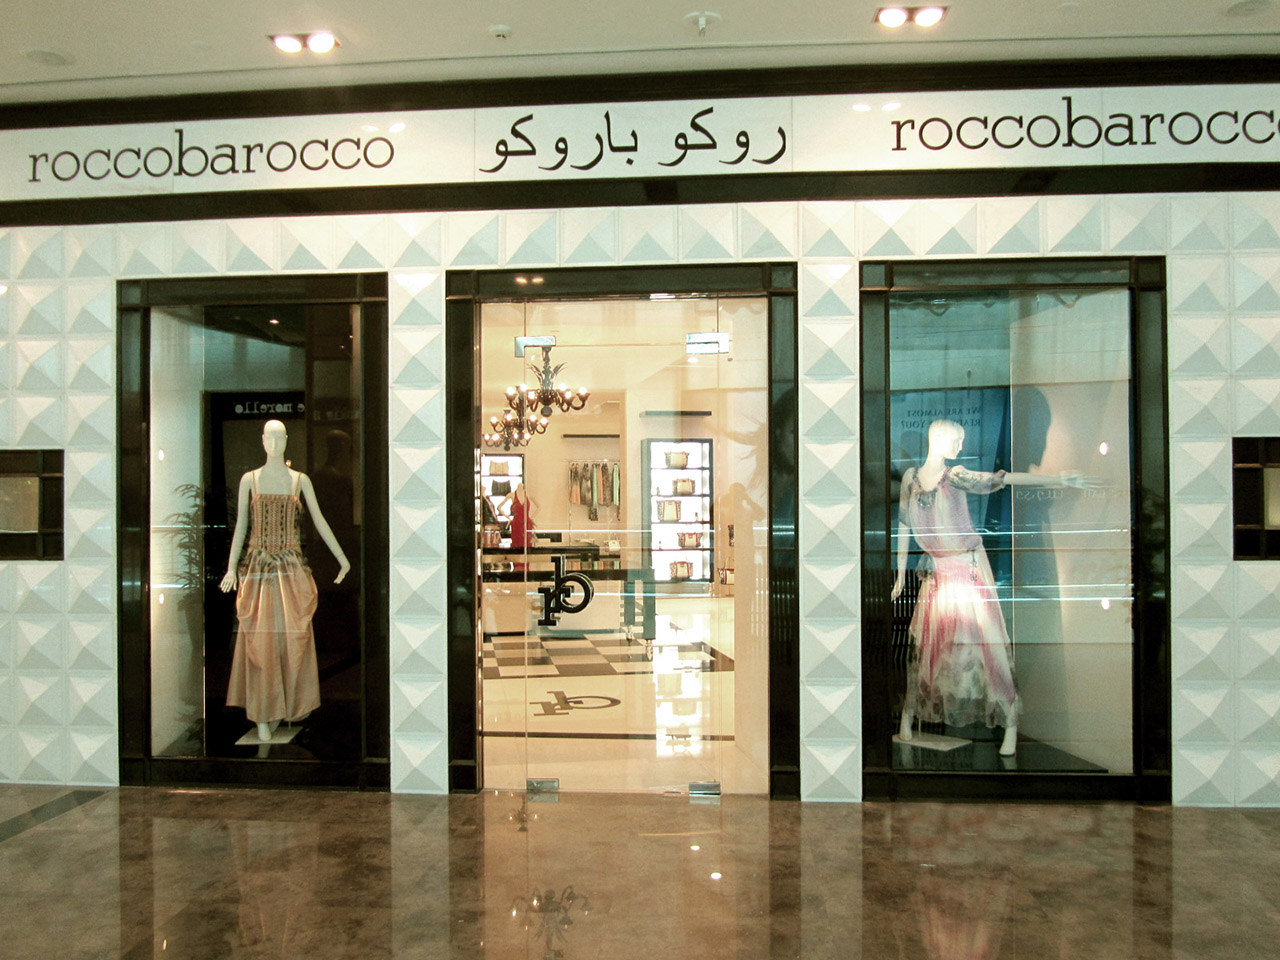 Roccobarocco Shop (Doha – Qatar) 03